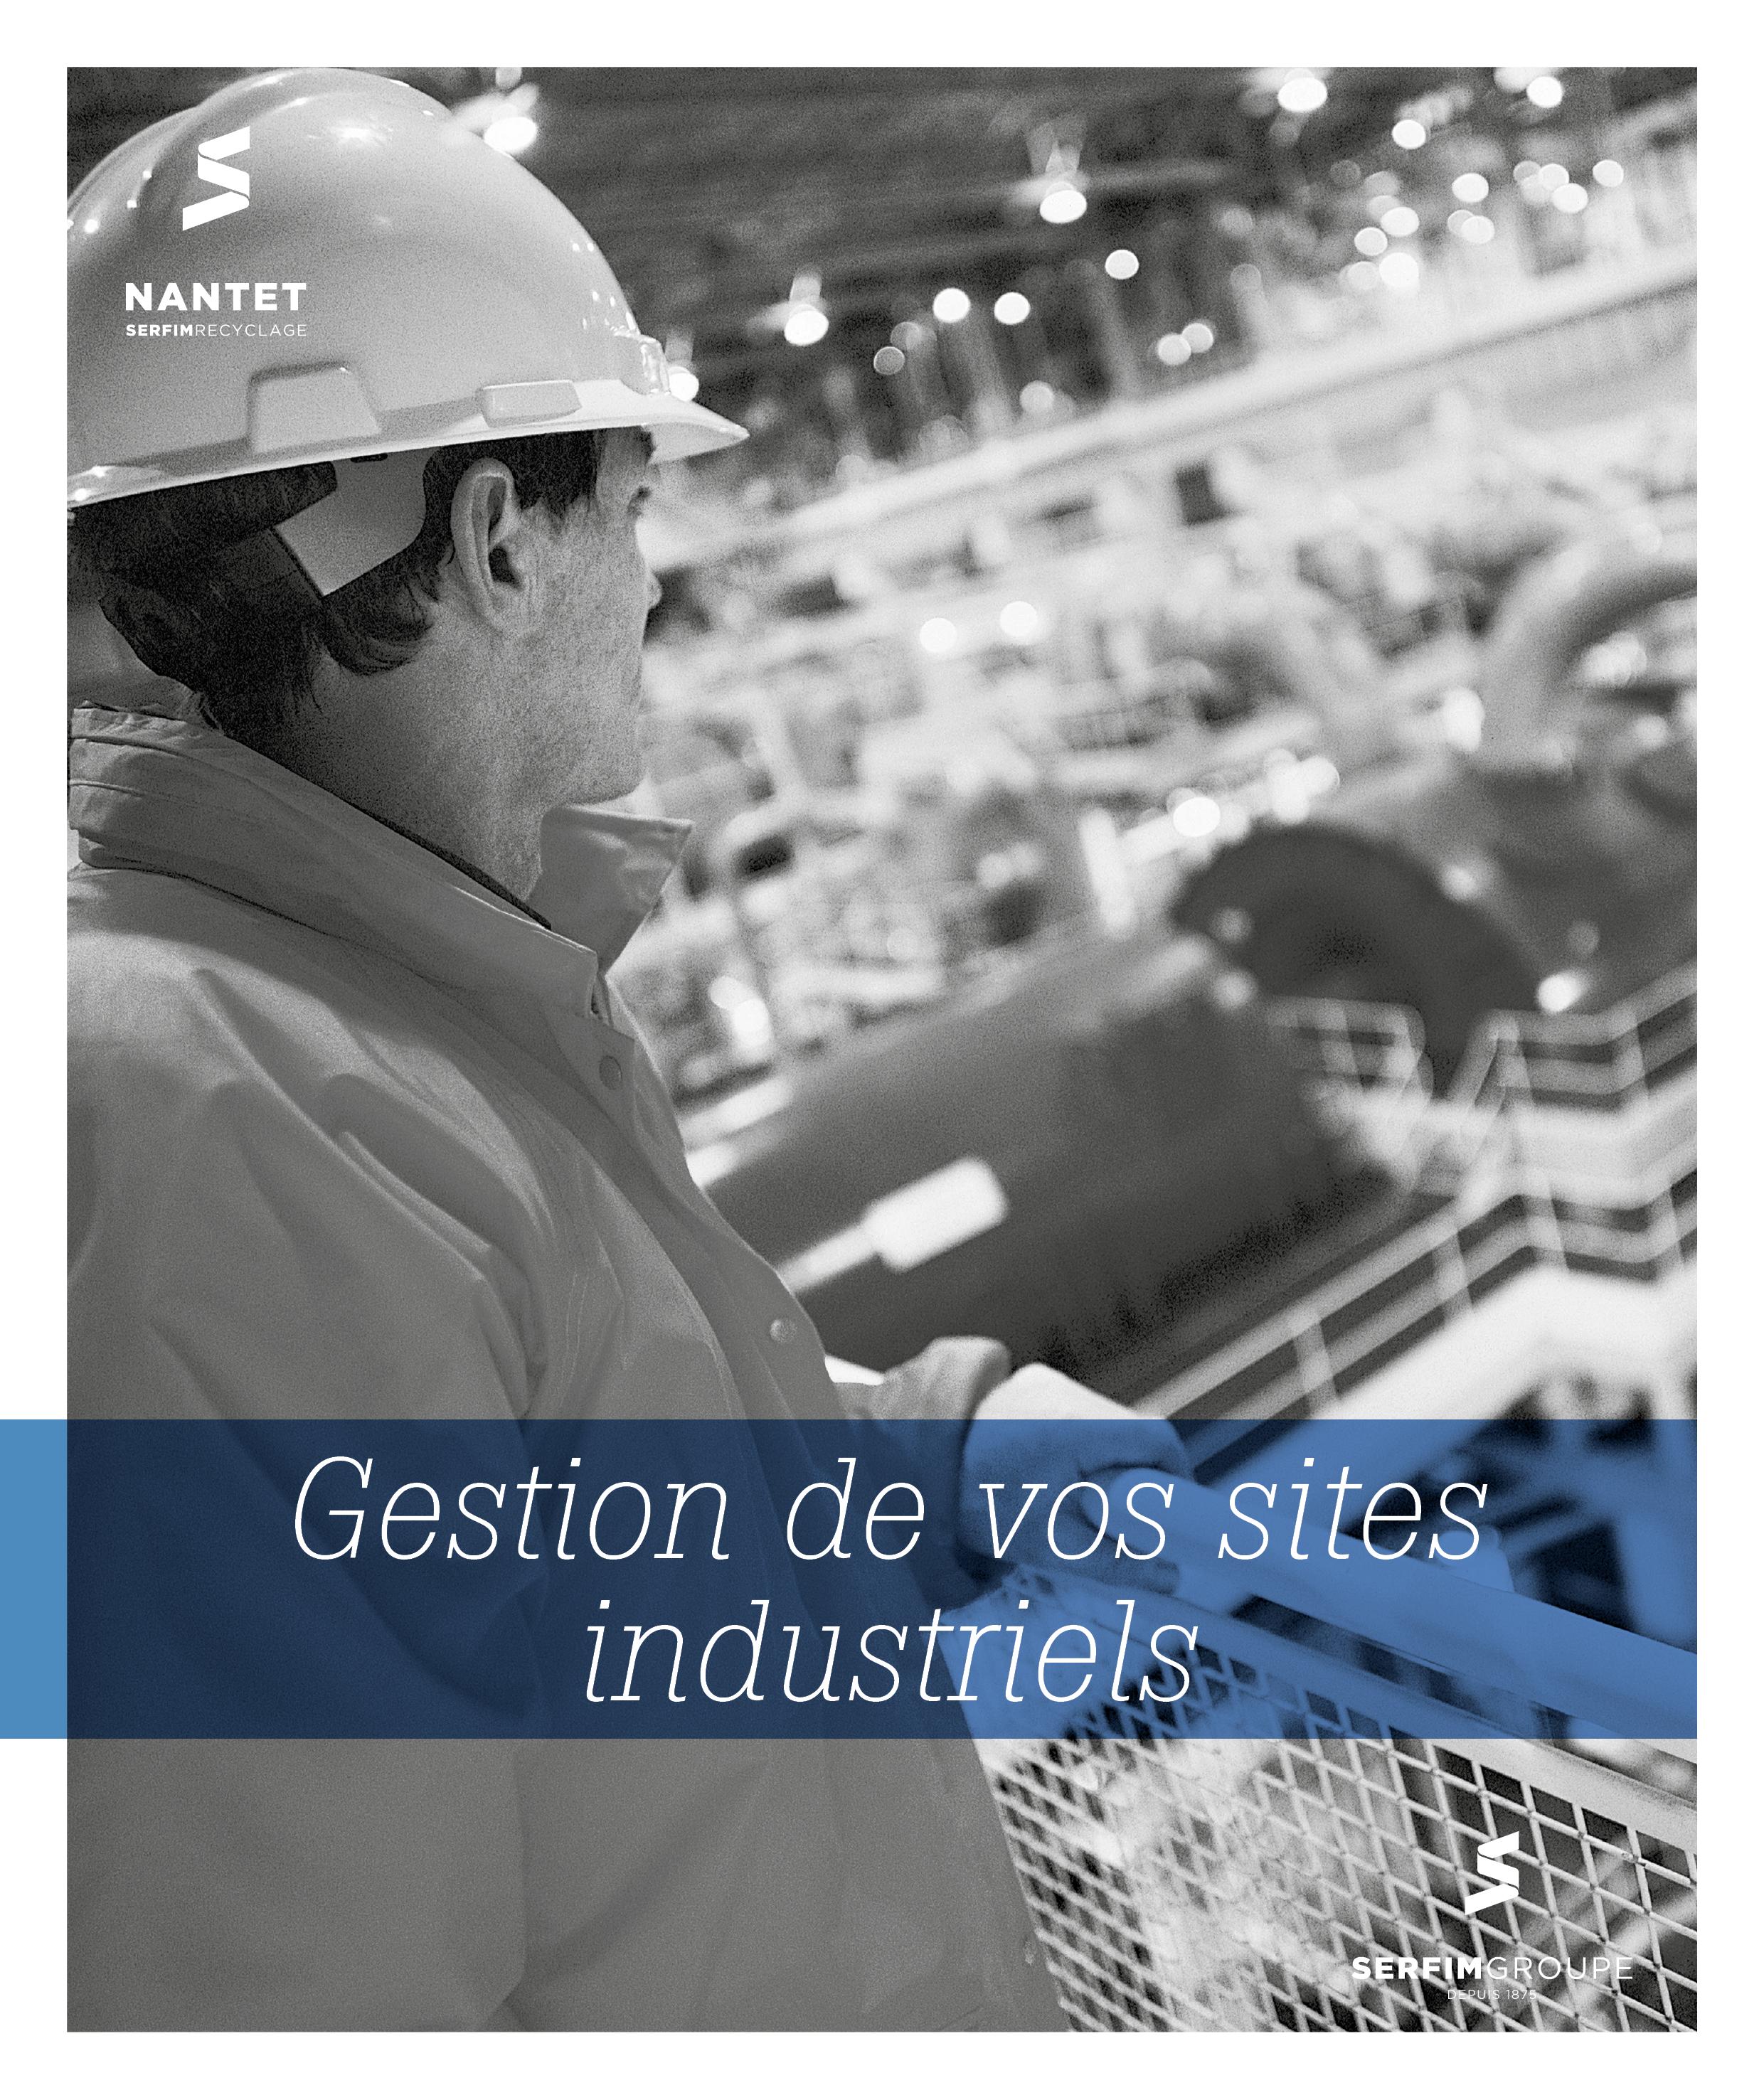 nantet_fiche-metier_industrie